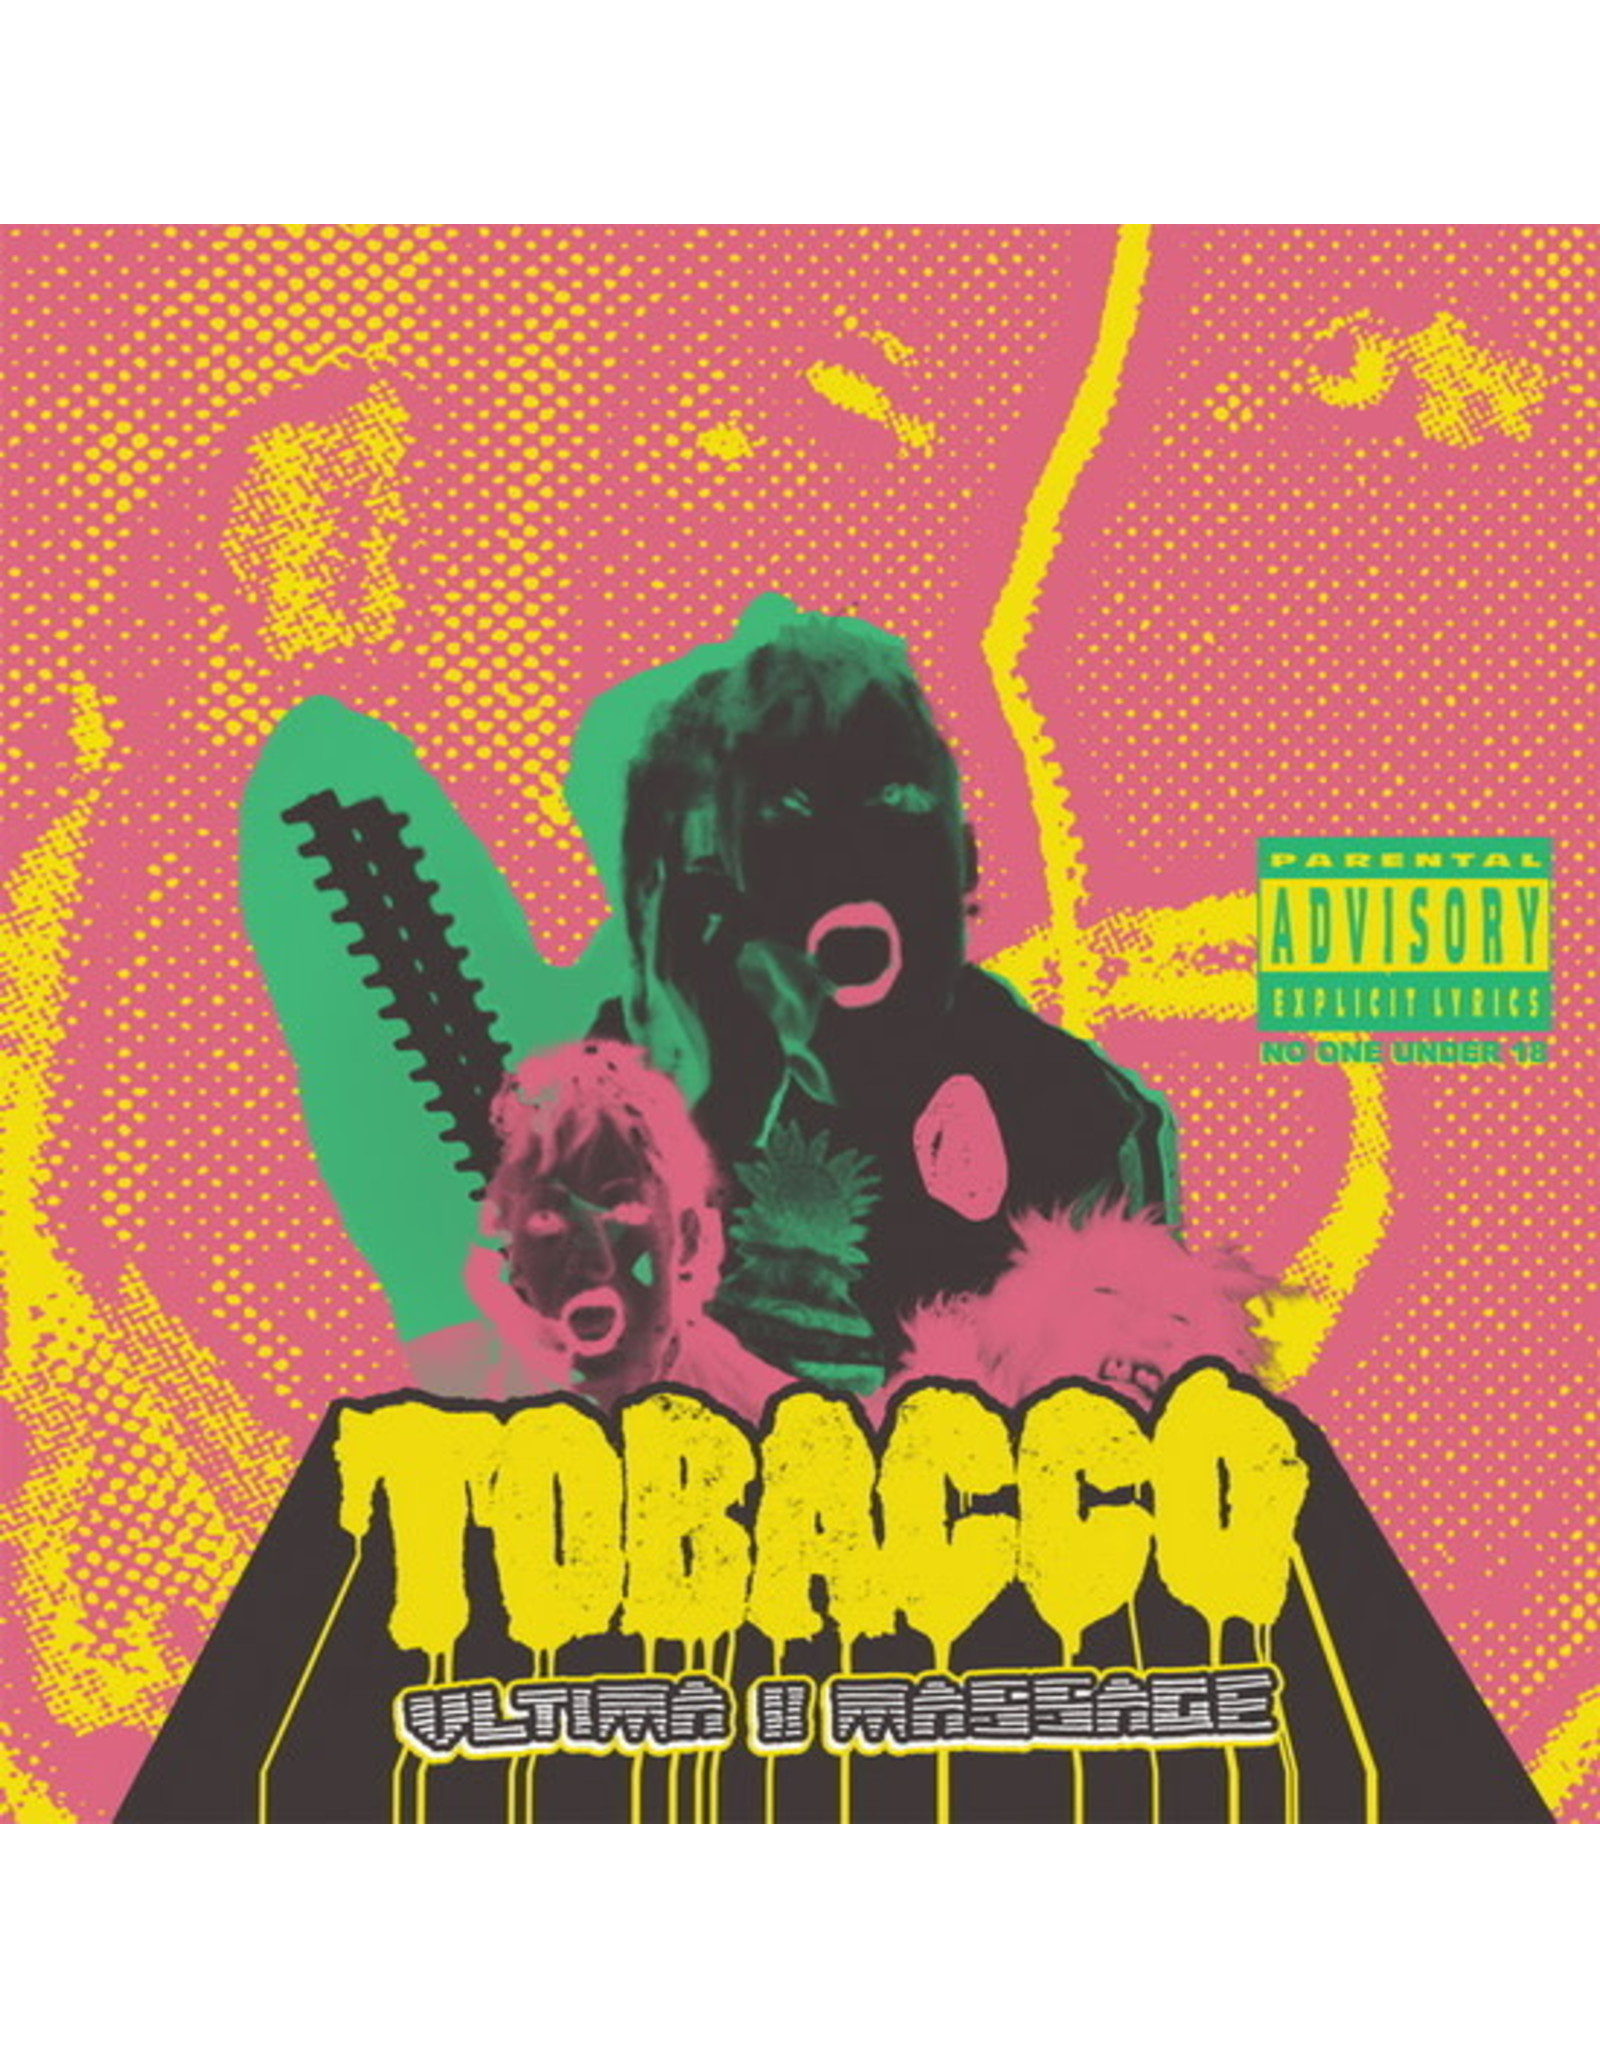 Tobacco - Ultima II Massage (Yellow) LP